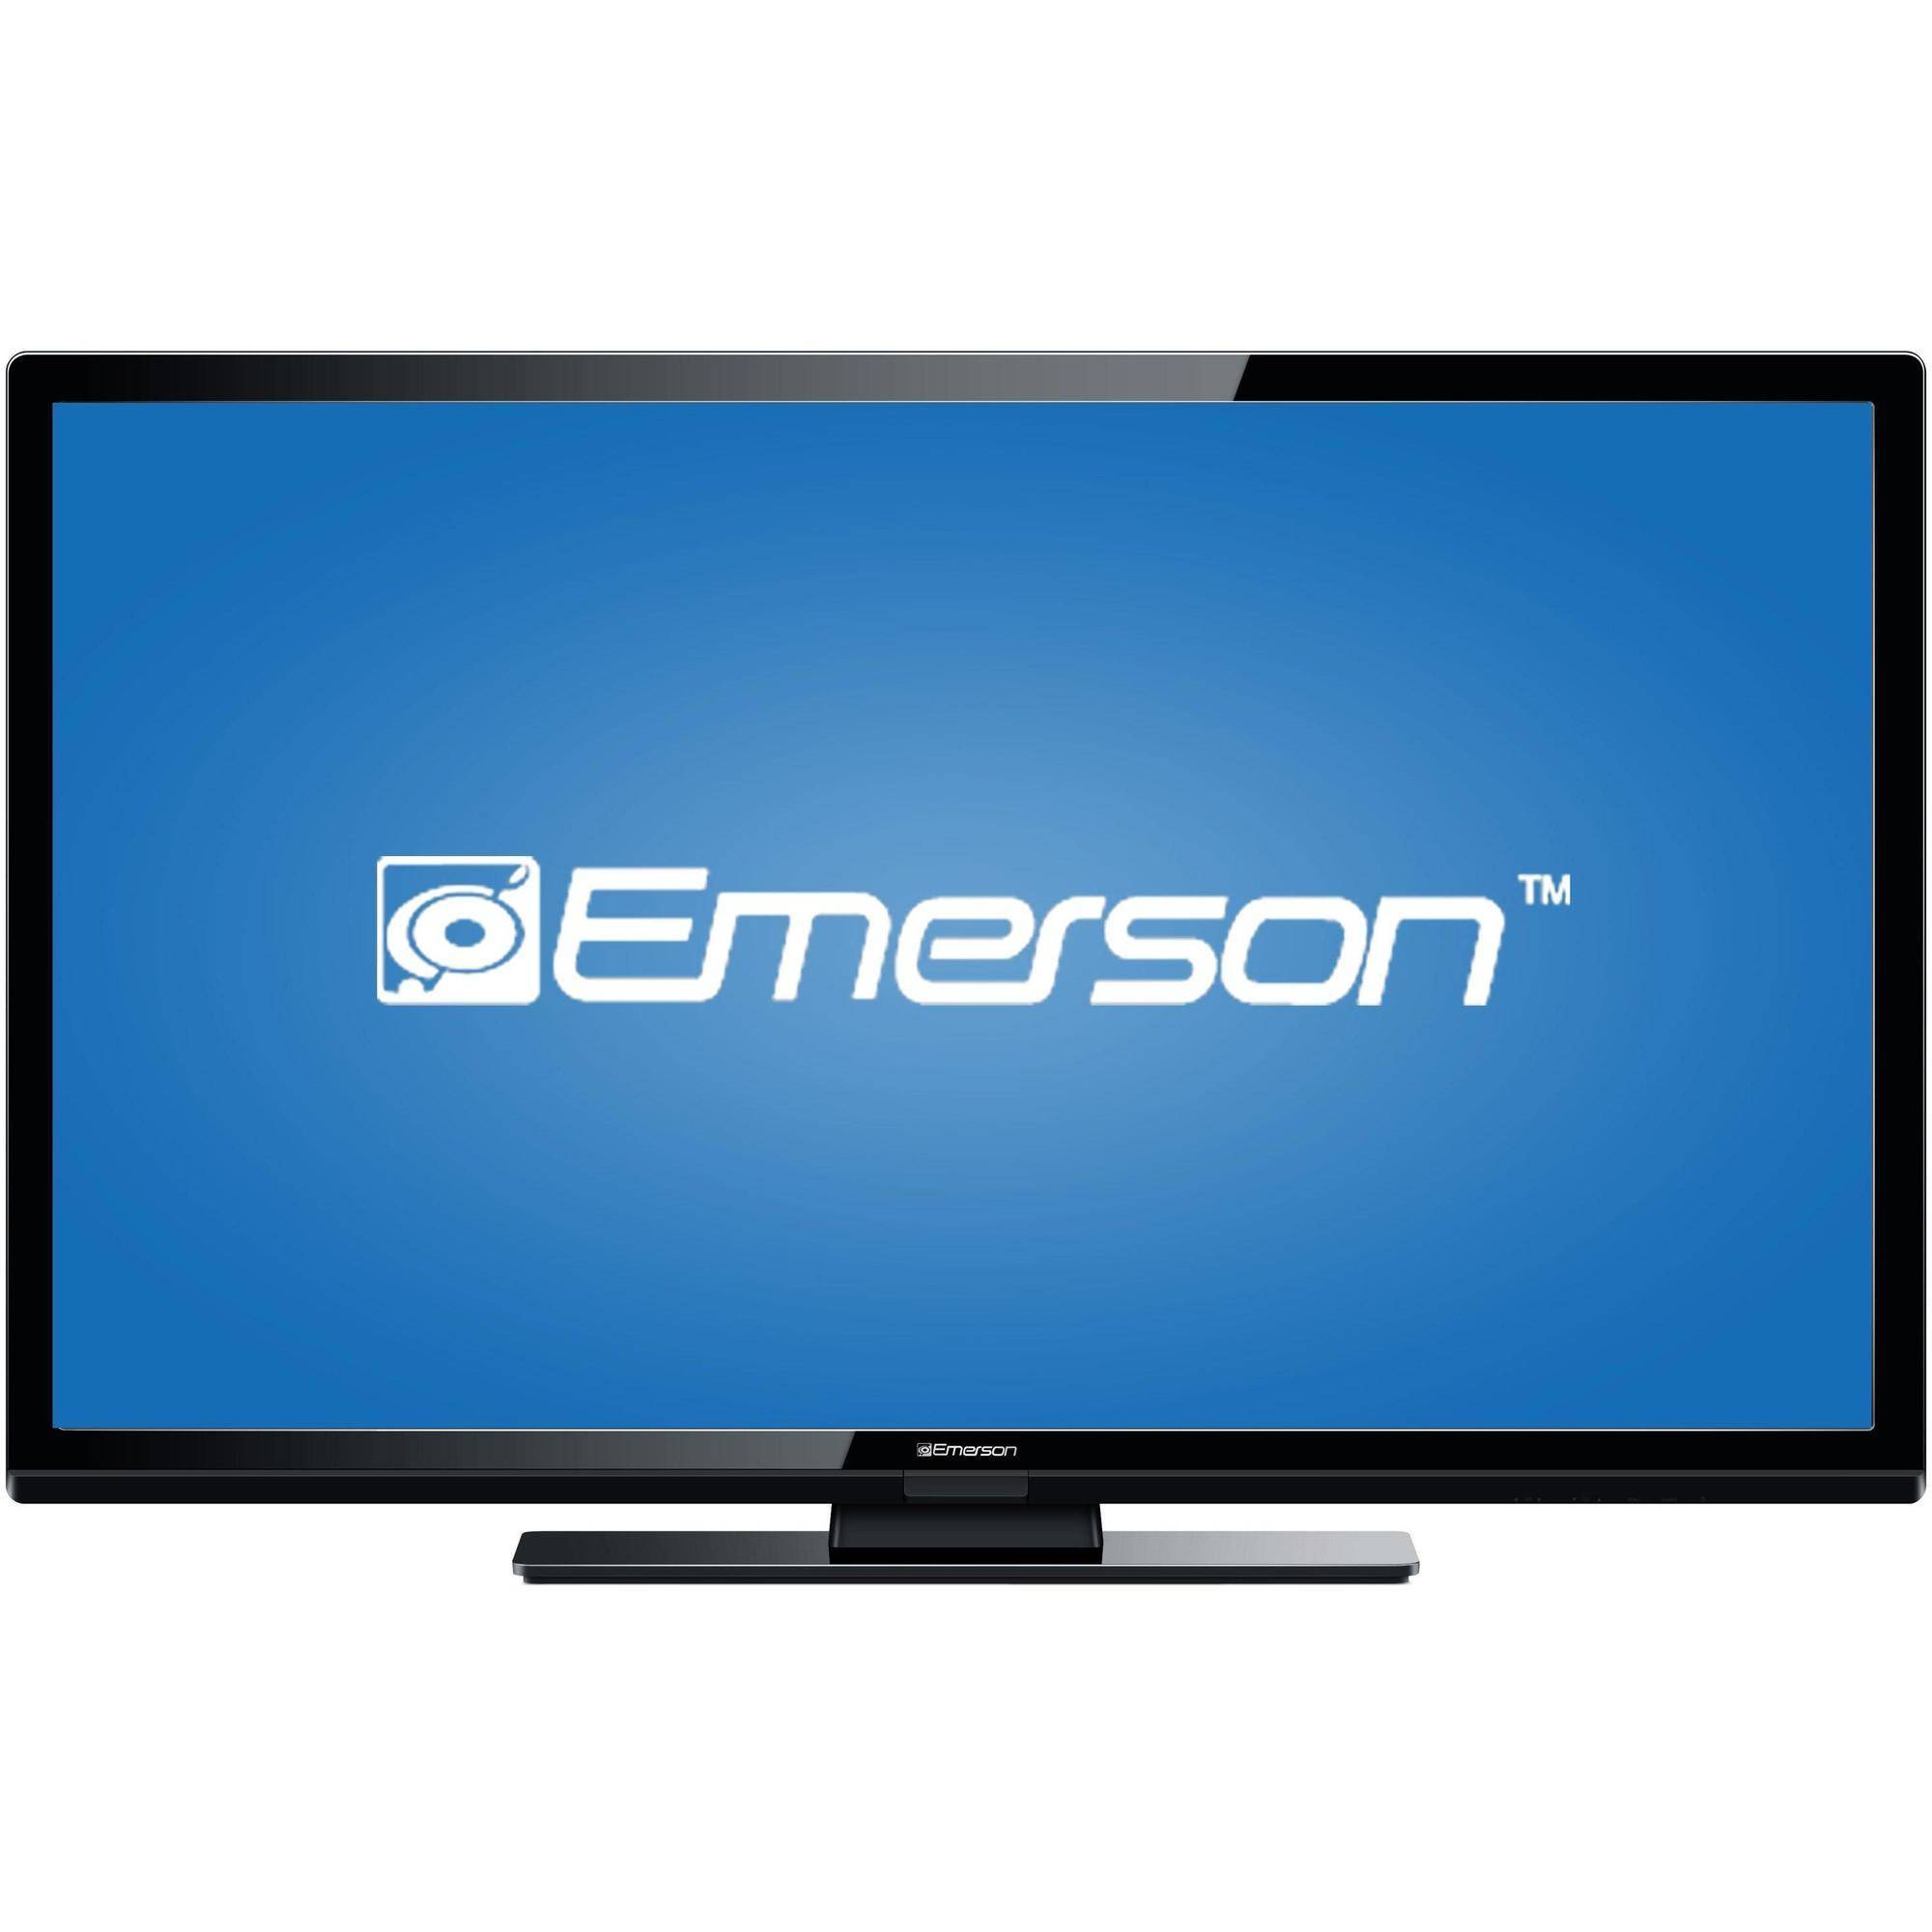 "Refurbished Emerson 50"" 1080p 120Hz Class LED HDTV (LF501EM6F) by Emerson"